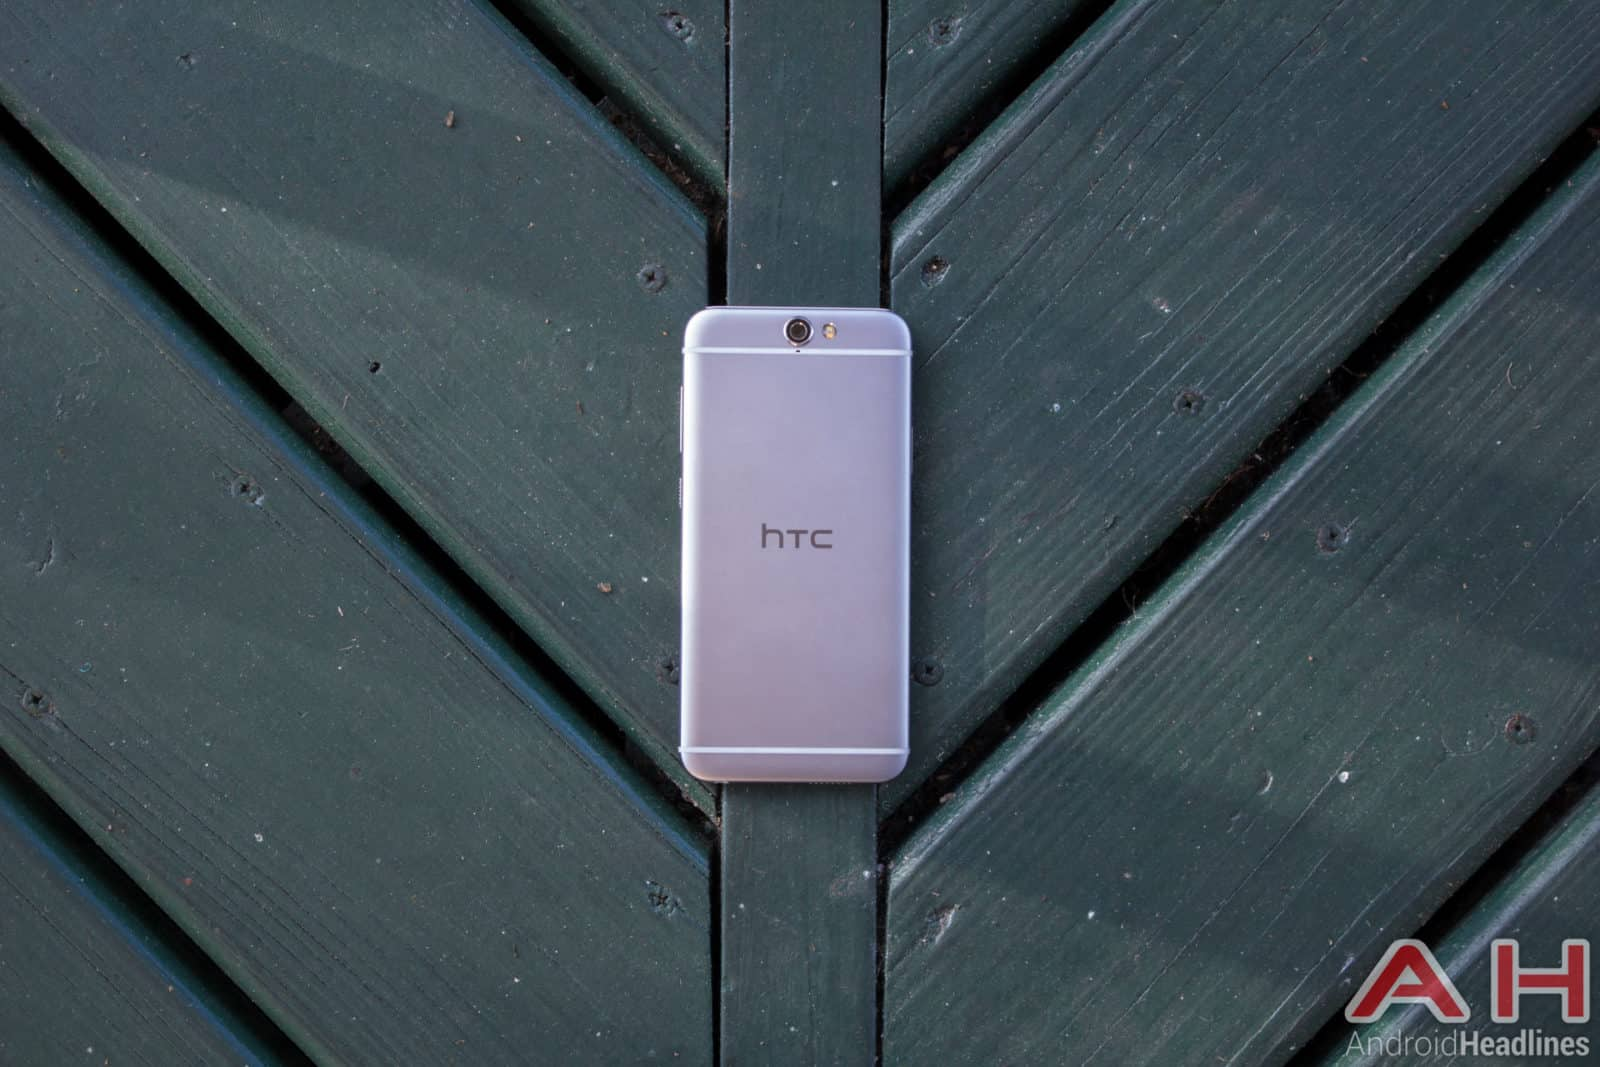 HTC-One-A9-AH-02